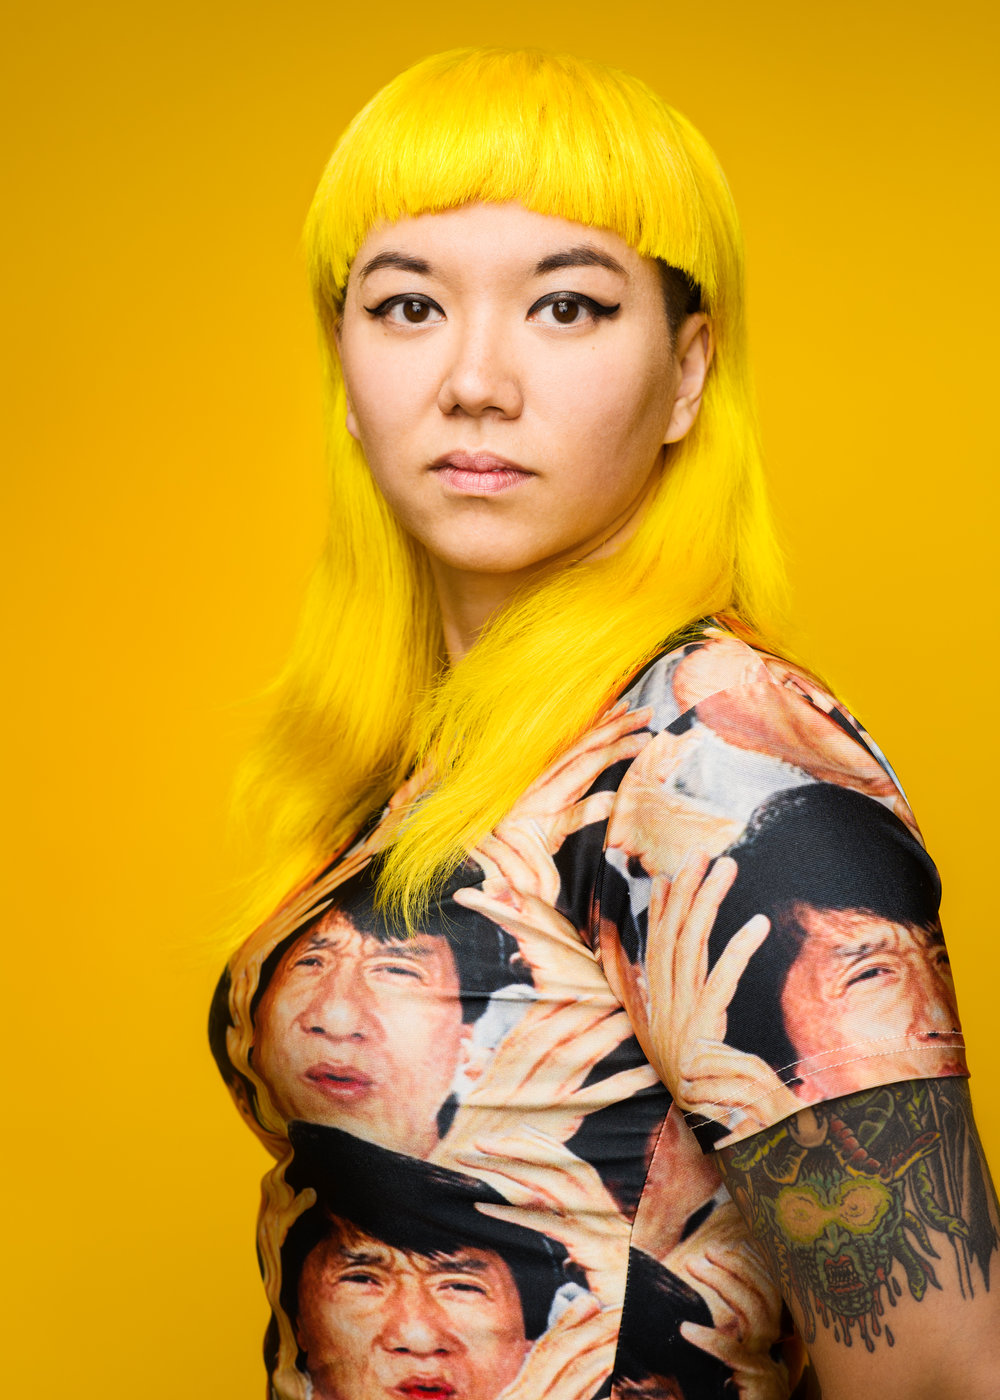 20170724jen-Lemasters-yellow-portrait-228_ver2.jpg